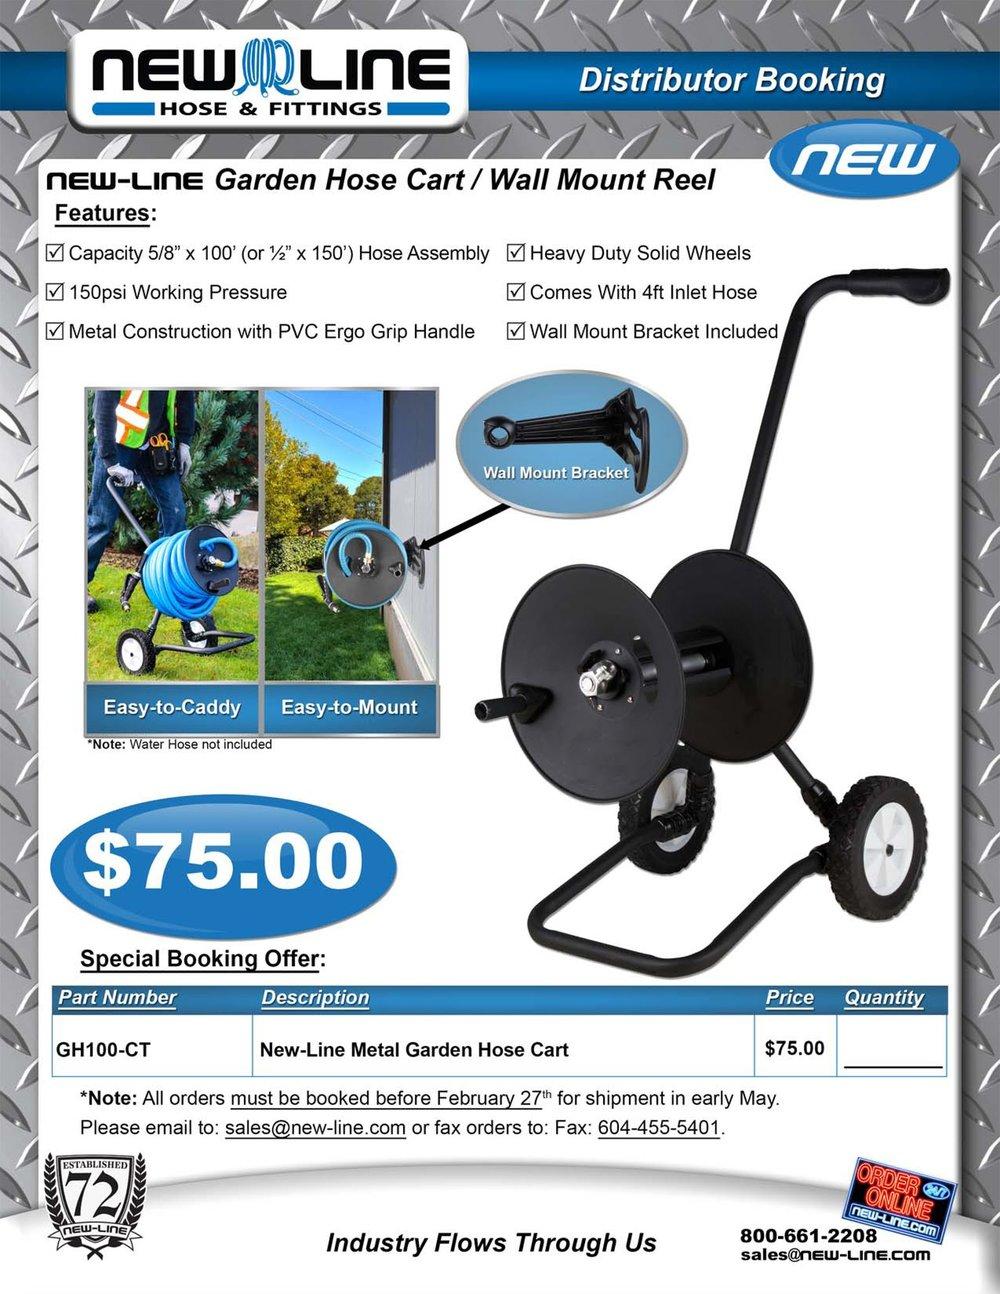 Newline-Garden-Hose-Reel-Distributor-Flyer-Jan-29-2014-Email.jpg